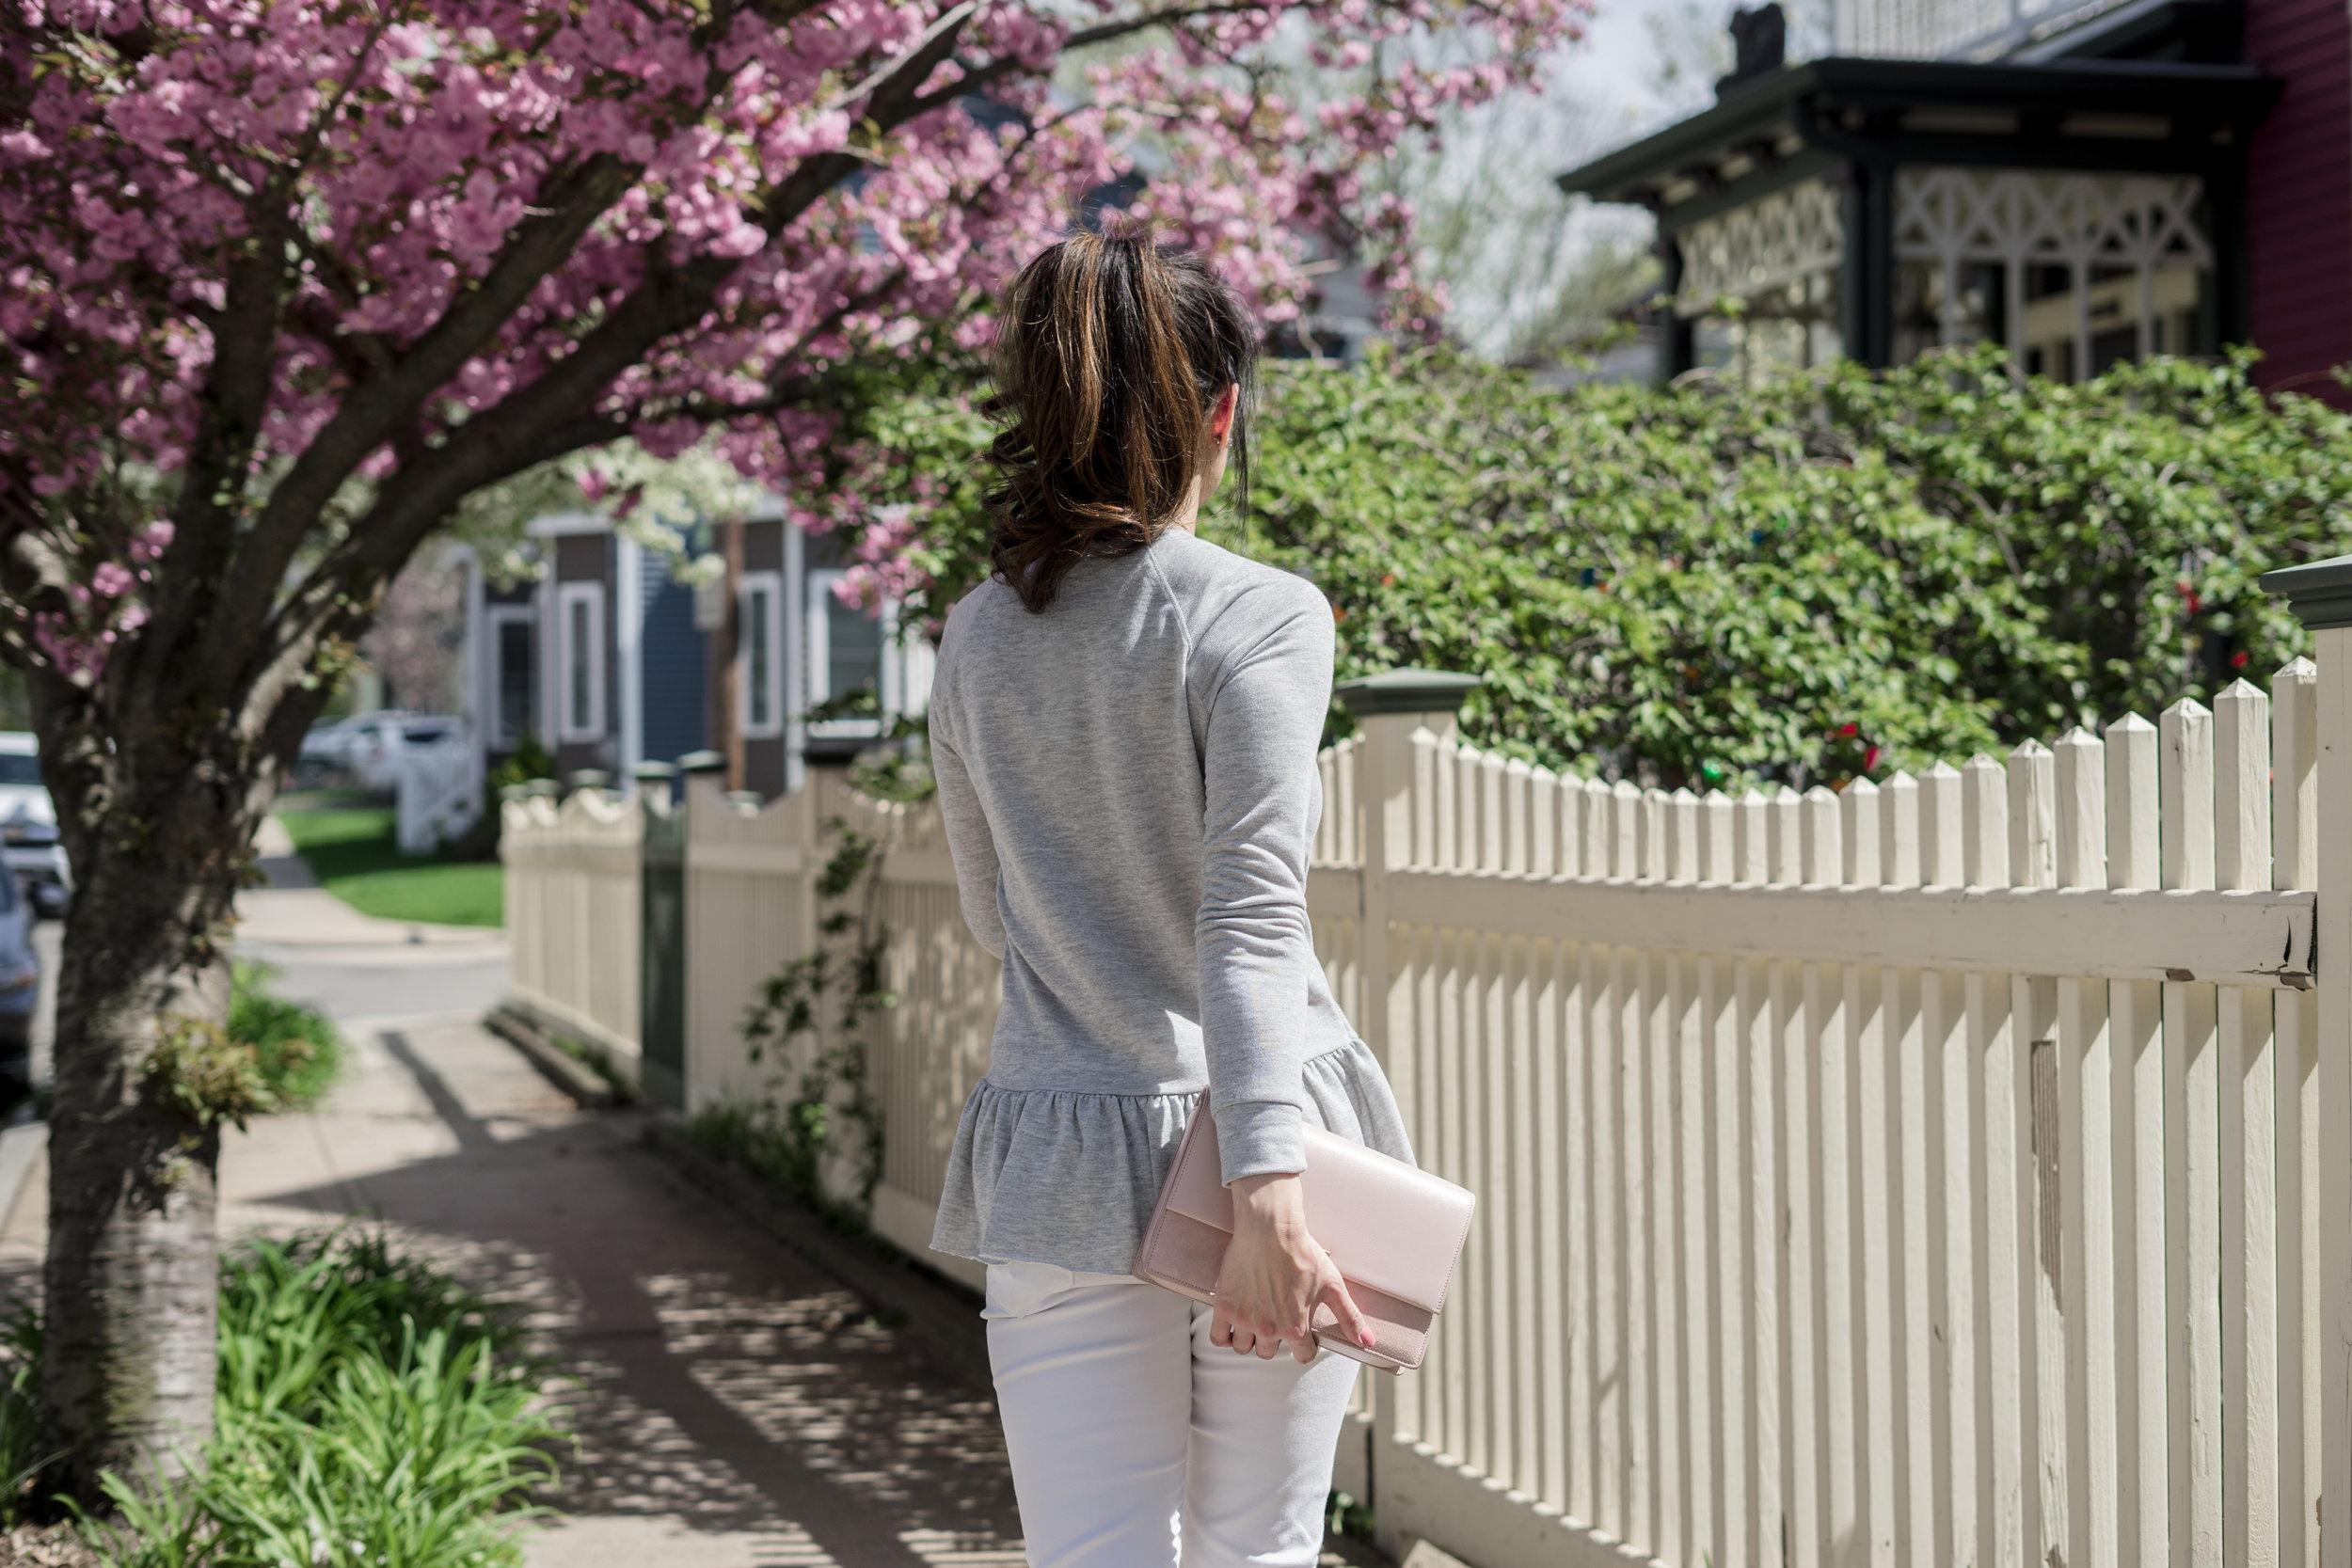 Casual Weekends with Gray Peplum Sweatshirt: TheNinesBlog.com - A Boston Blog